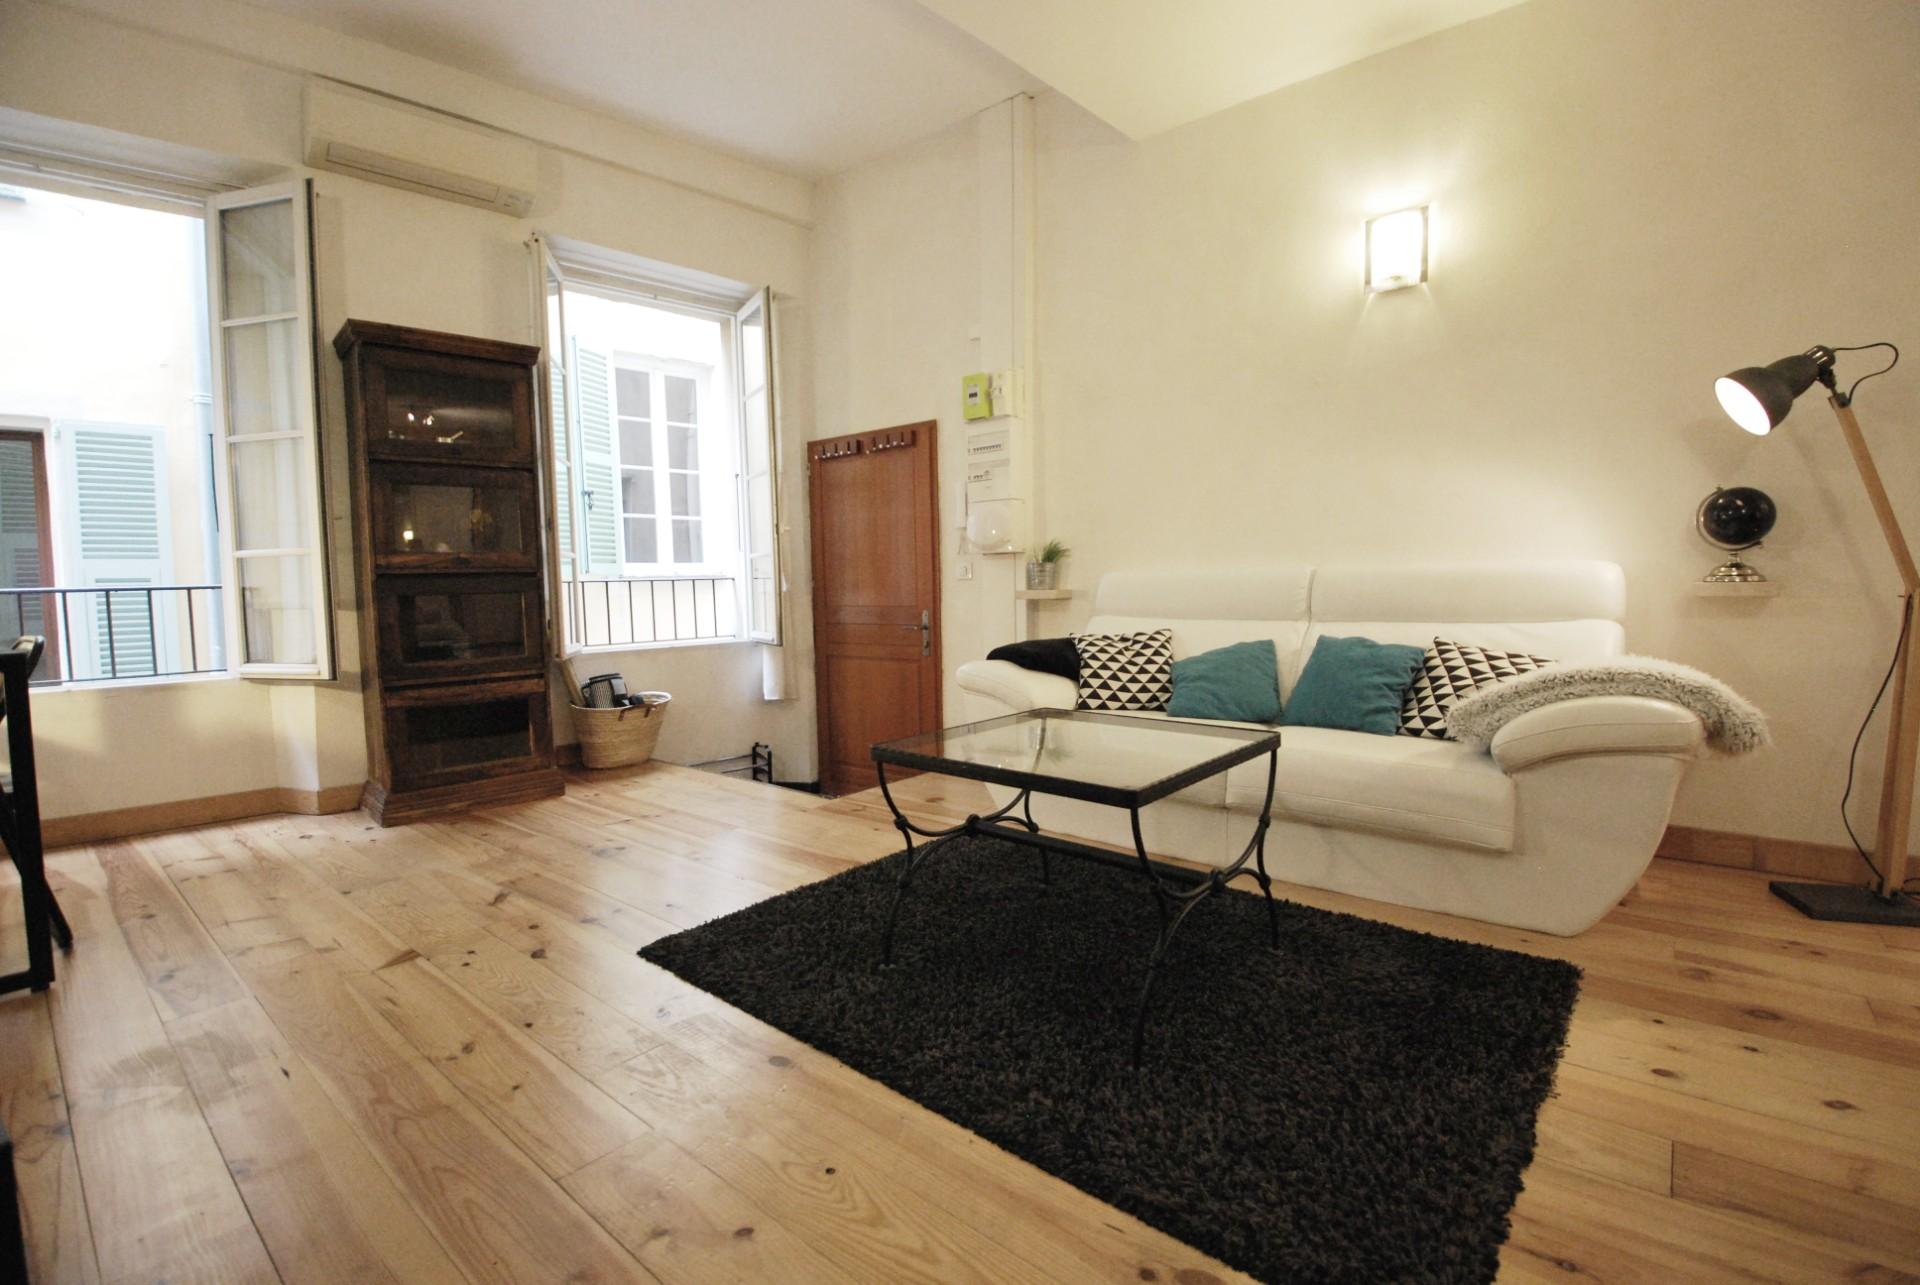 conciergerie airbnb nice